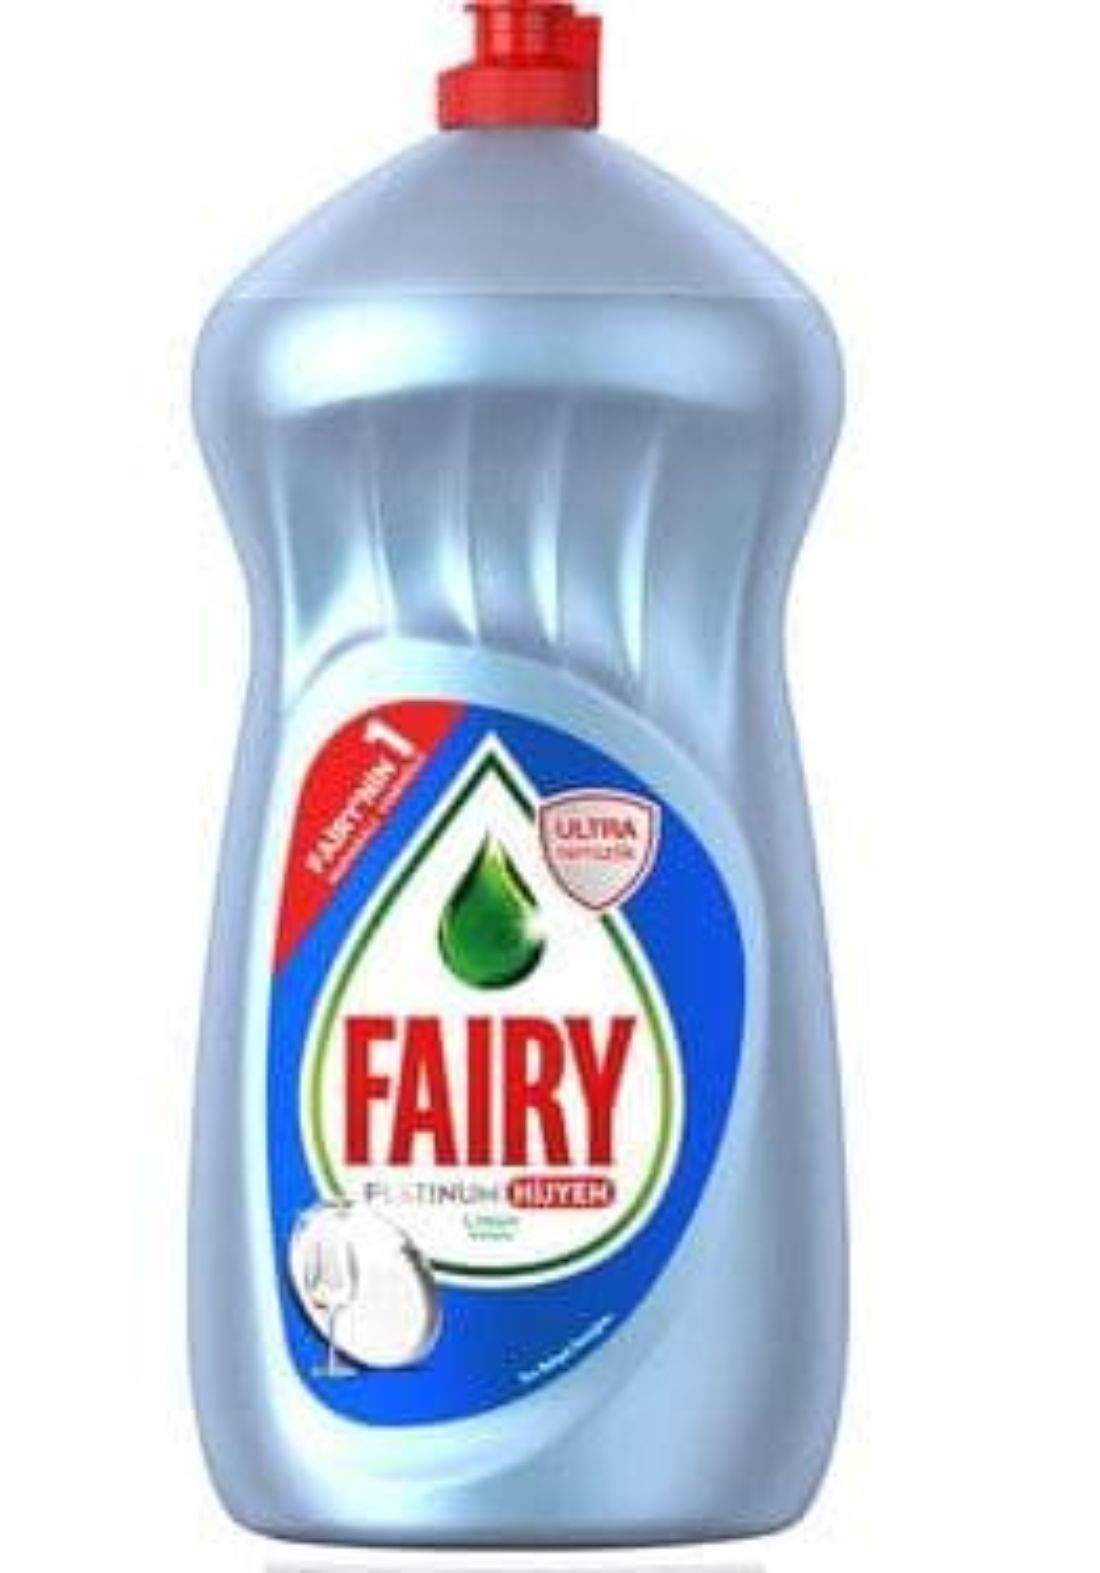 Fairy Dishwashing liquid750ml فيري سائل التنظيف الاواني